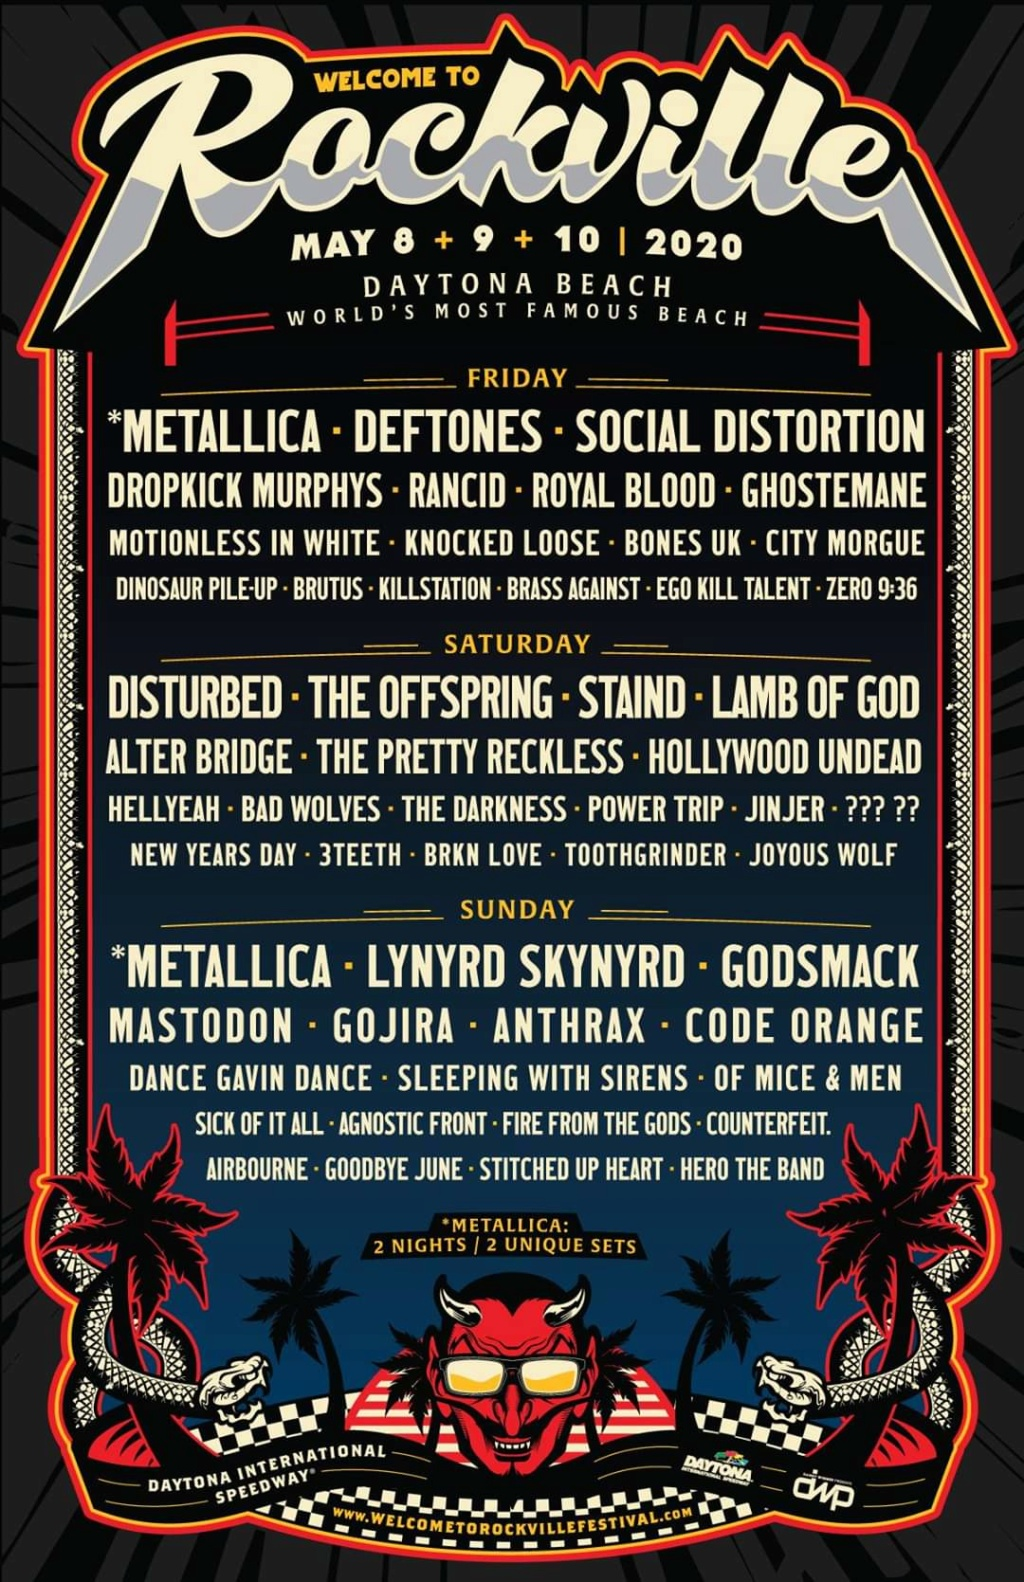 Azkena Rock Festival 2020. 19-20 Junio. Patti Smith - Página 17 Fb_img17